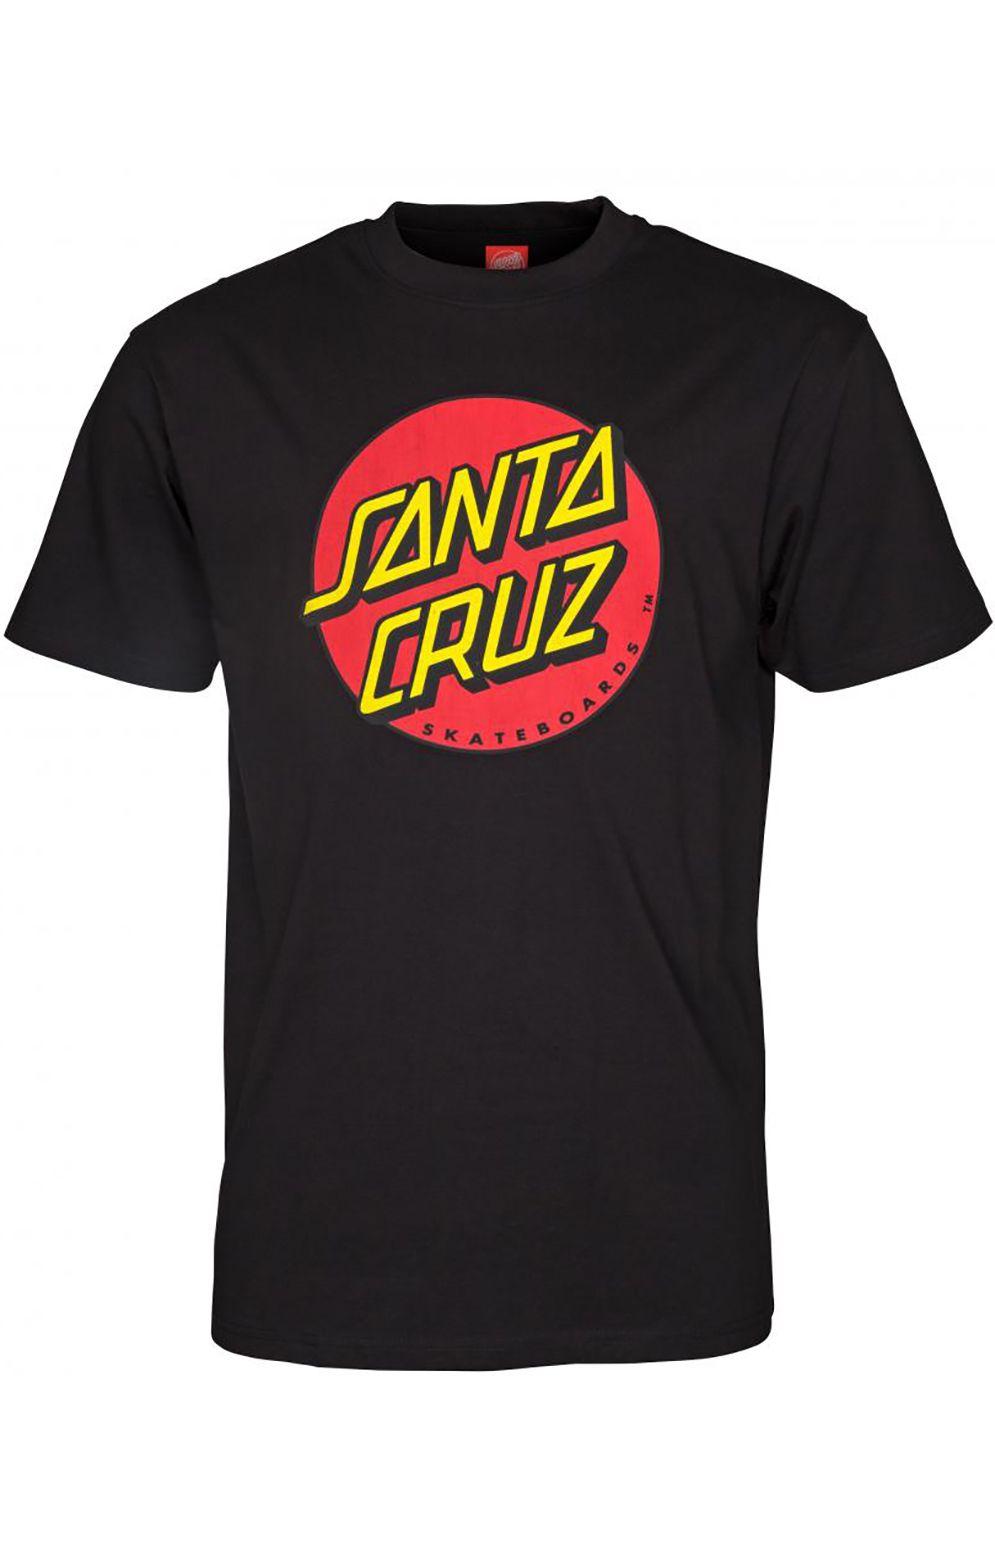 T-Shirt Santa Cruz CLASSIC DOT Black